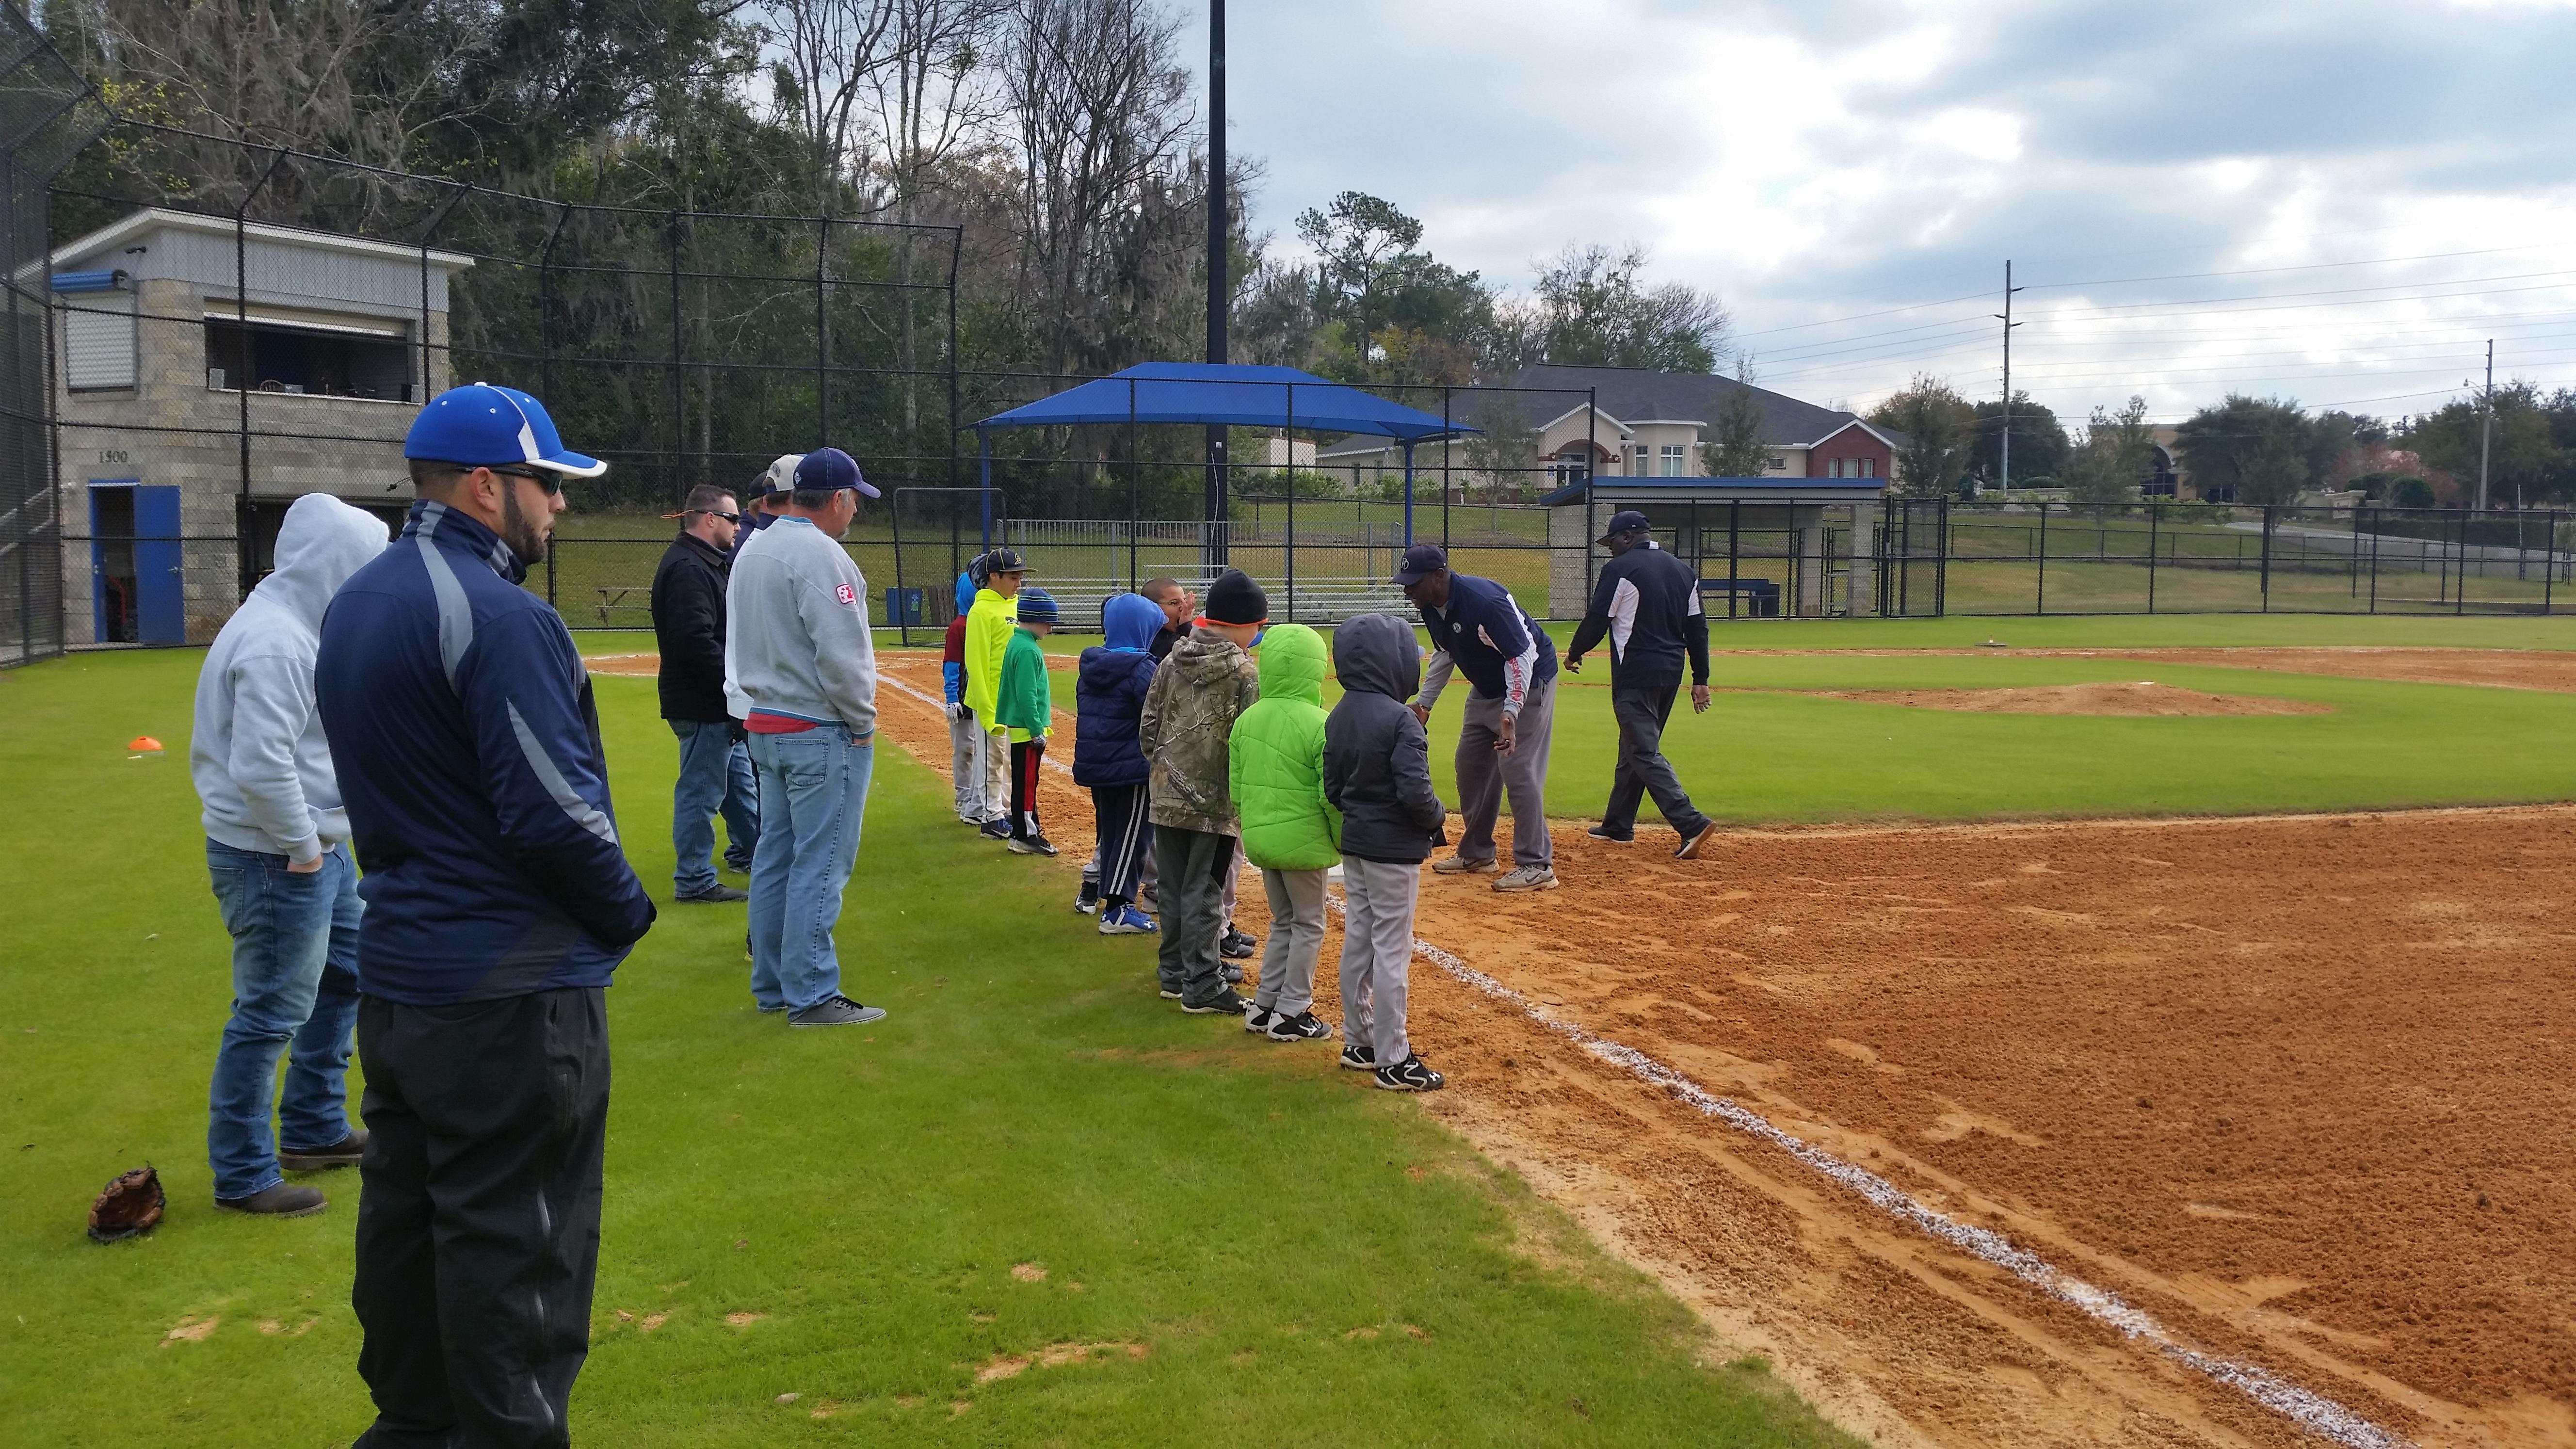 01-23-2016 Dixon Baseball Clinic (2)